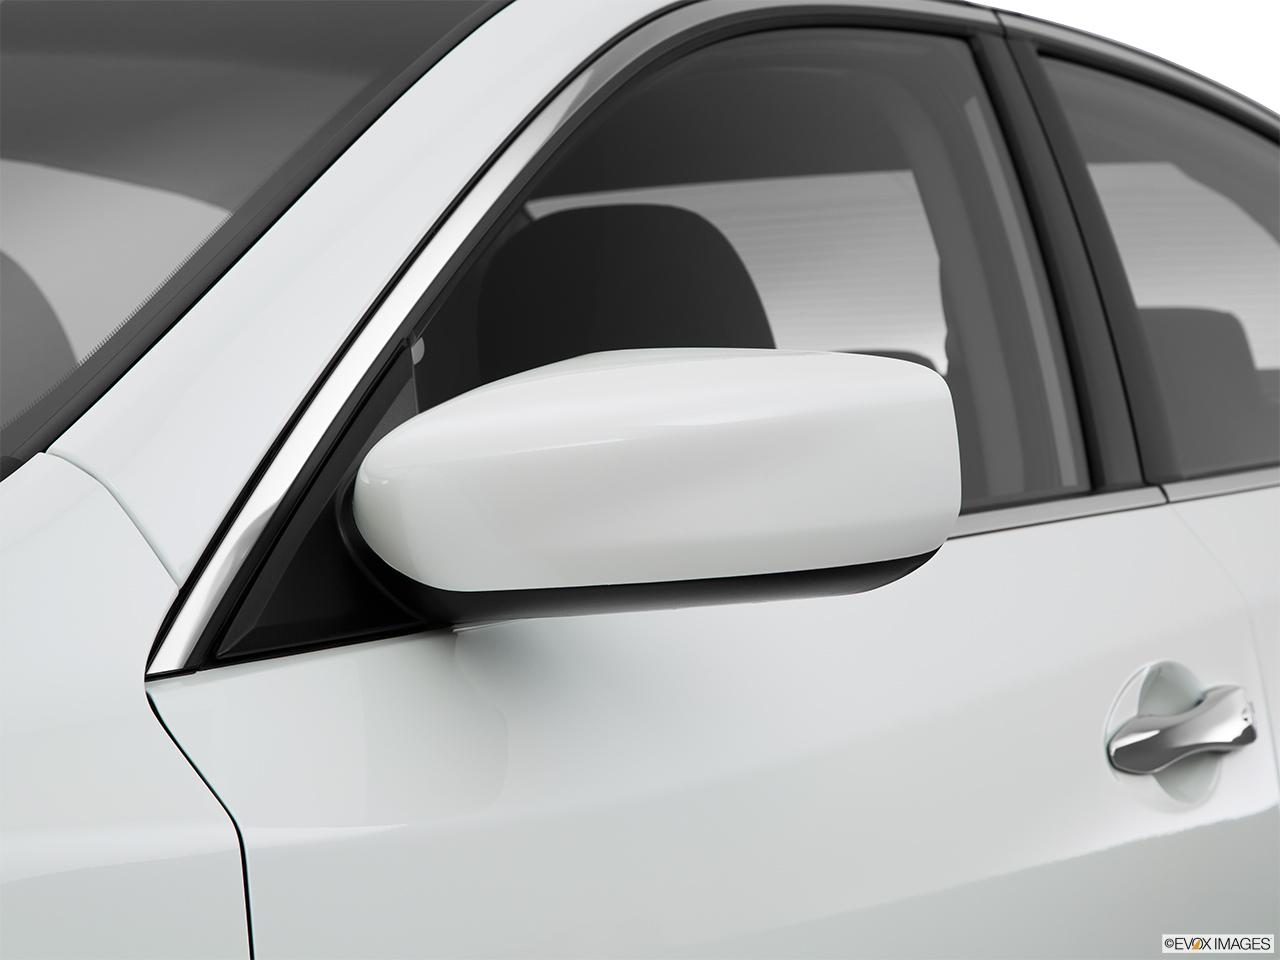 2015 Nissan Altima I4 2 5 Sedan Front Angle View 2015 Nissan